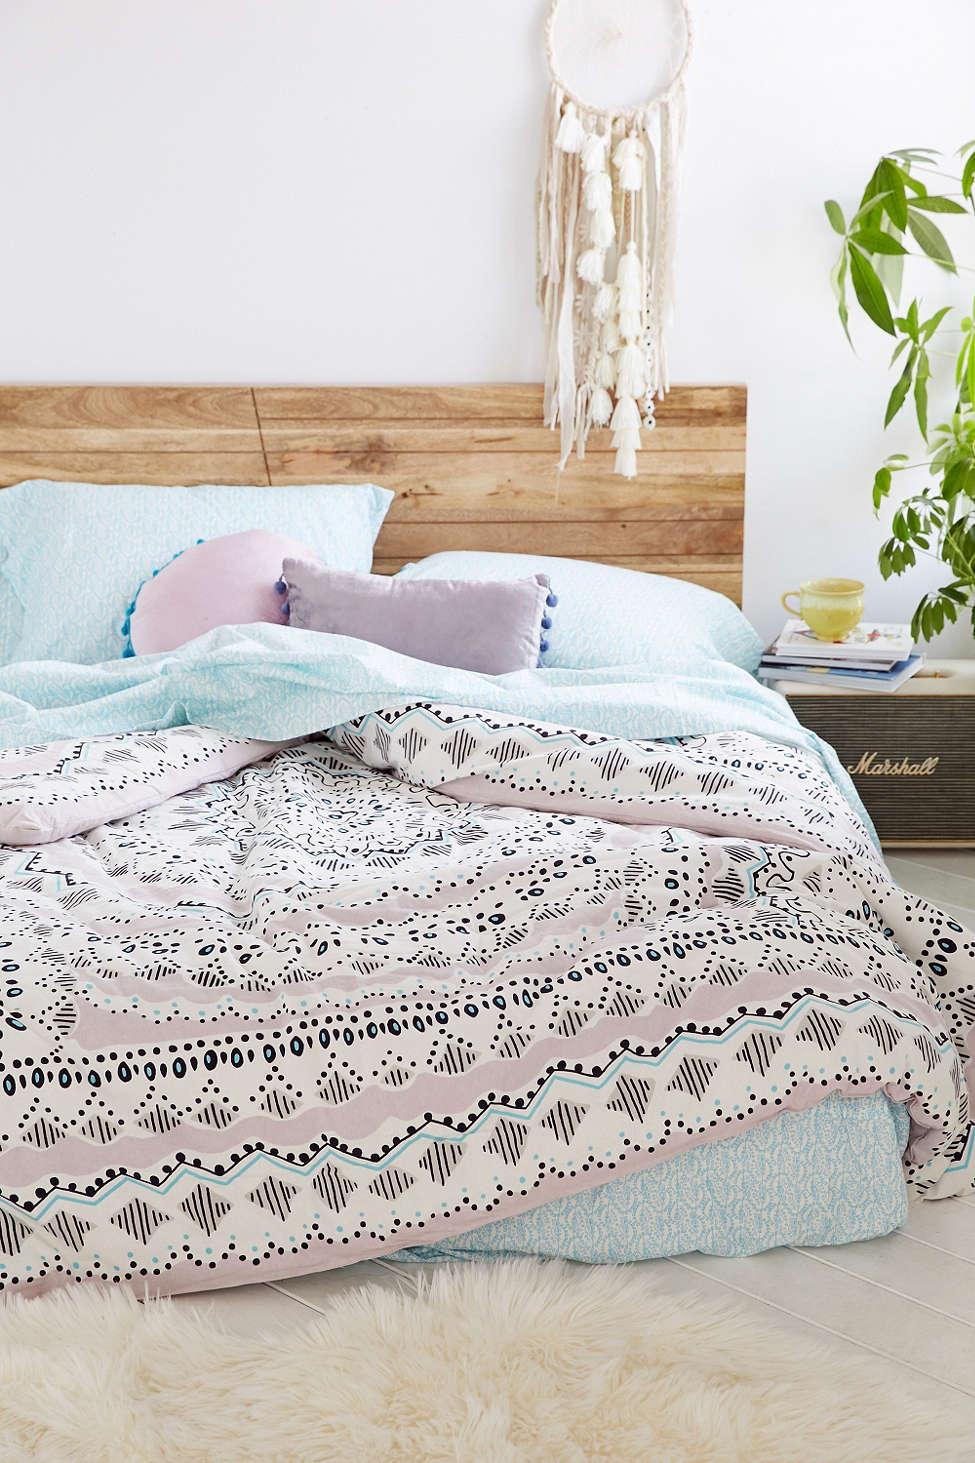 Chicdeco Blog   Understated Boho-chic Bedroom Decor